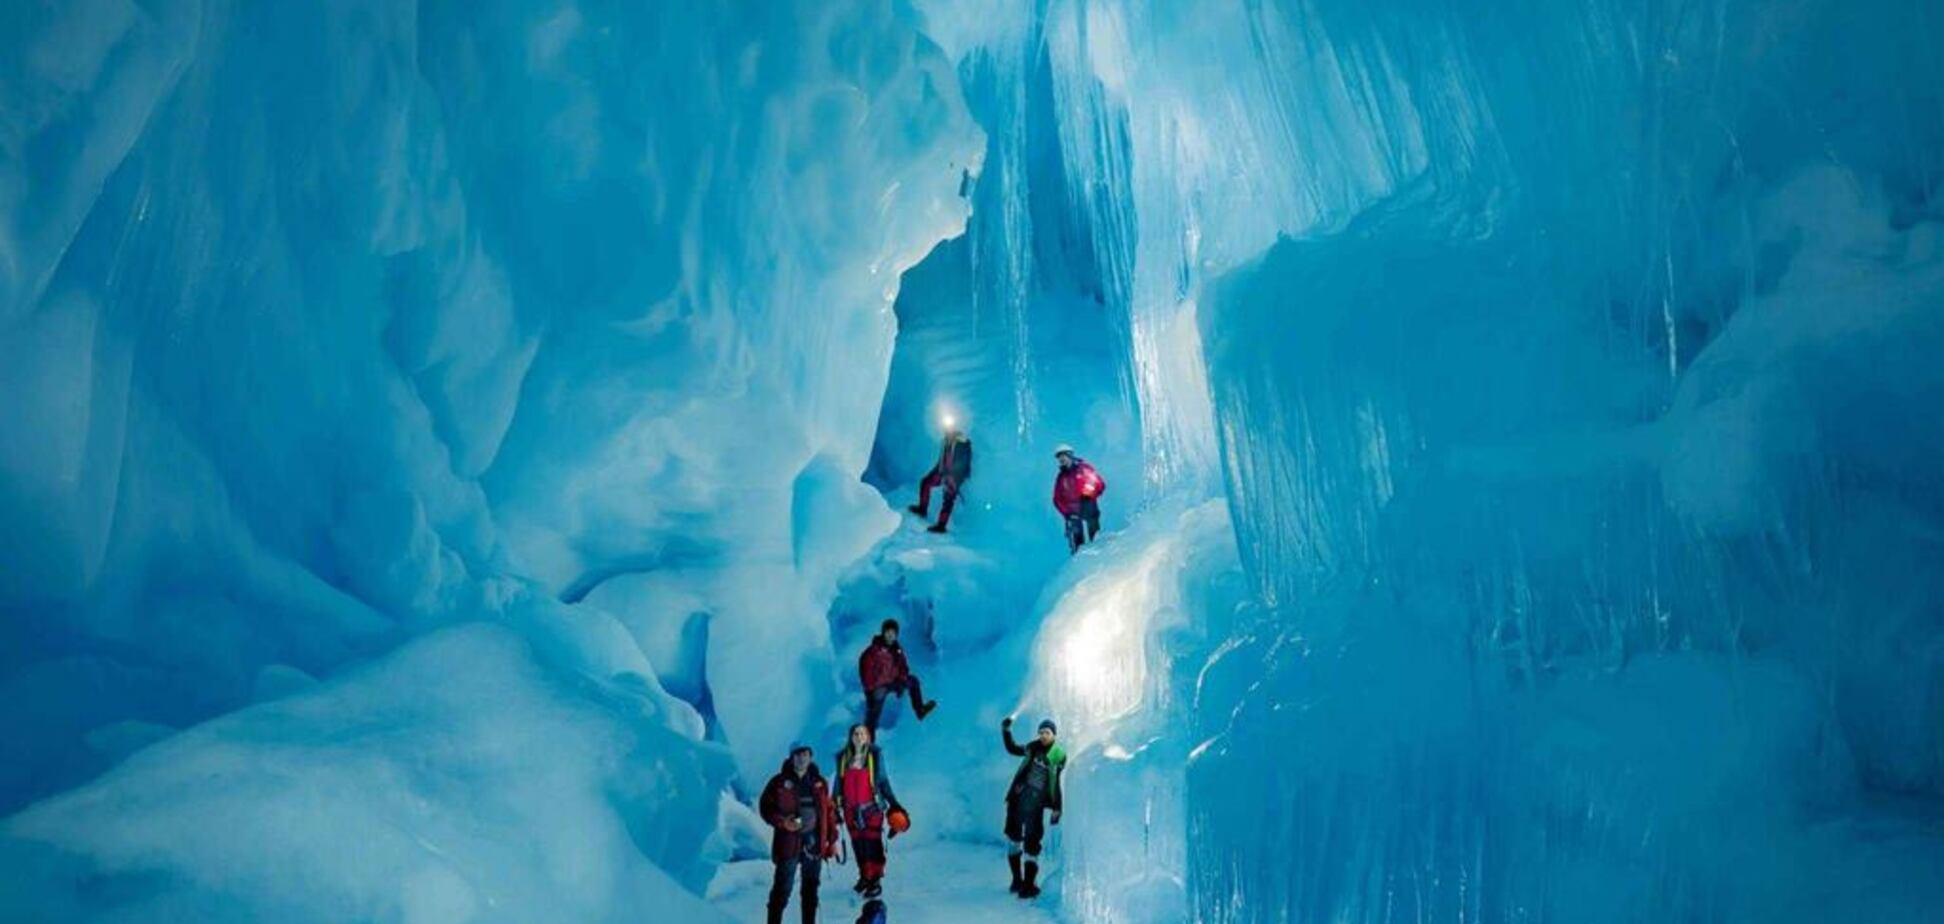 Загублена печера в Антарктиді